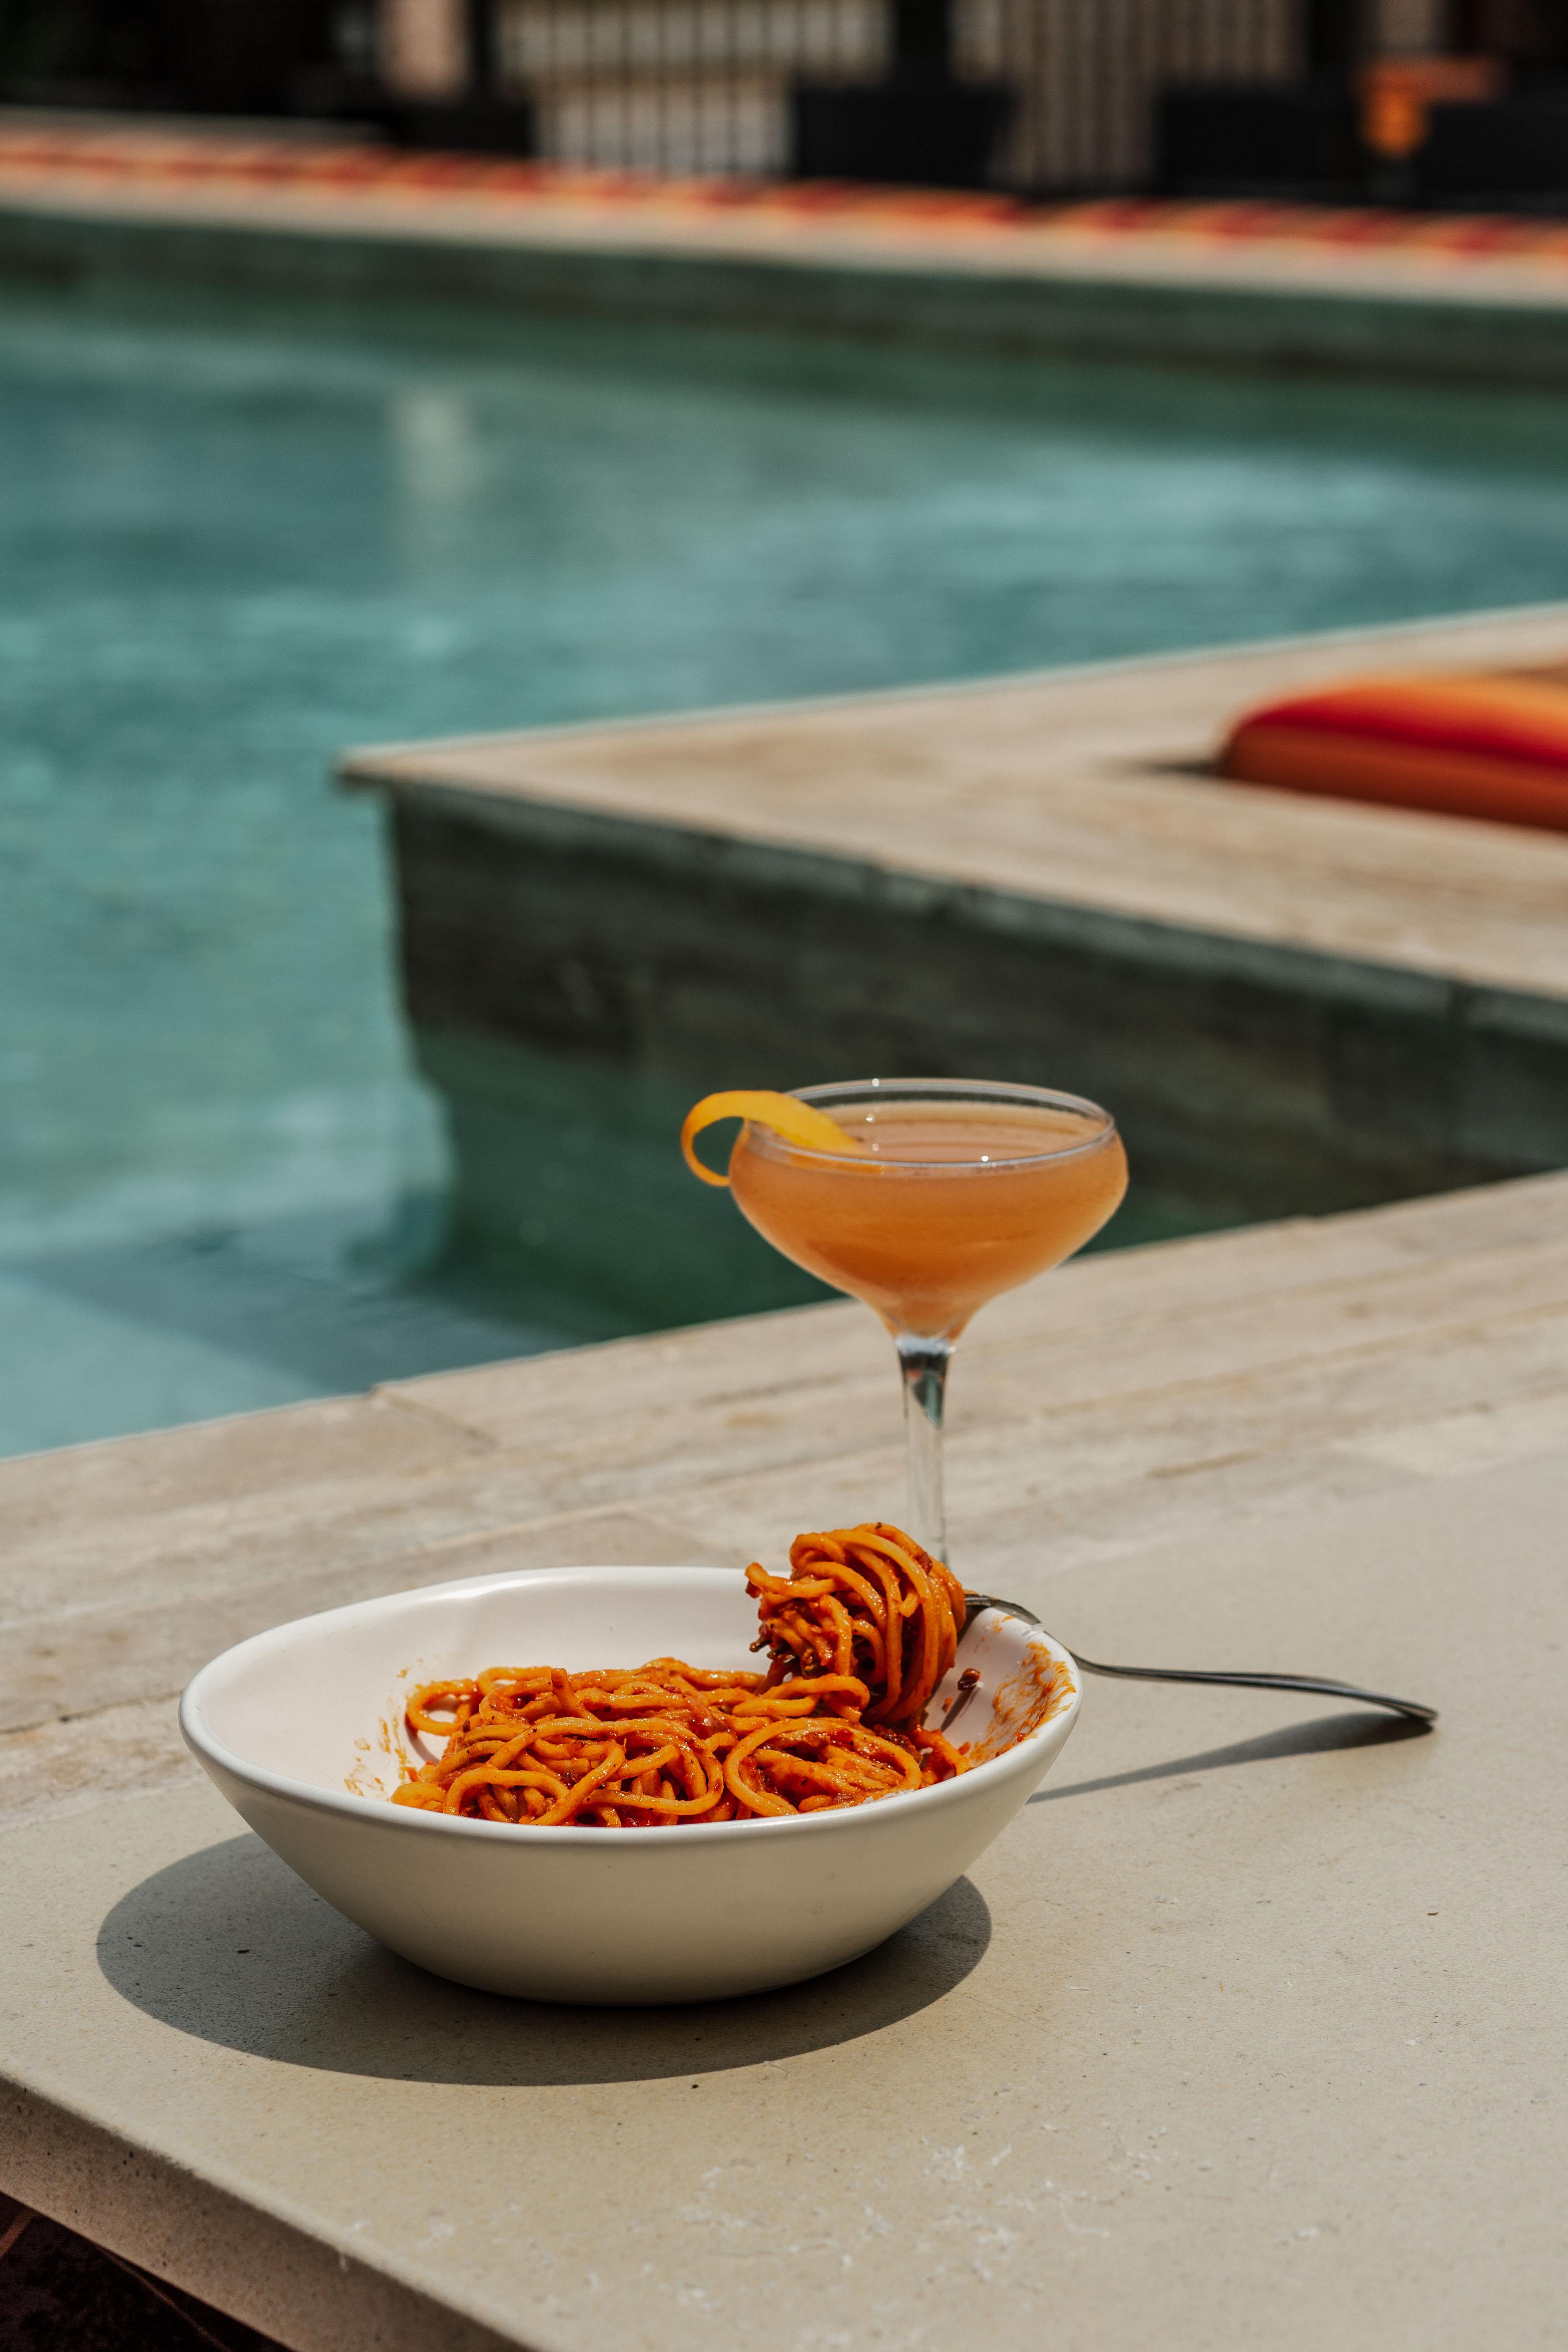 Pasta Mulino Italian Kitchen & Bar. Photography by Jamie Robbins.-7131